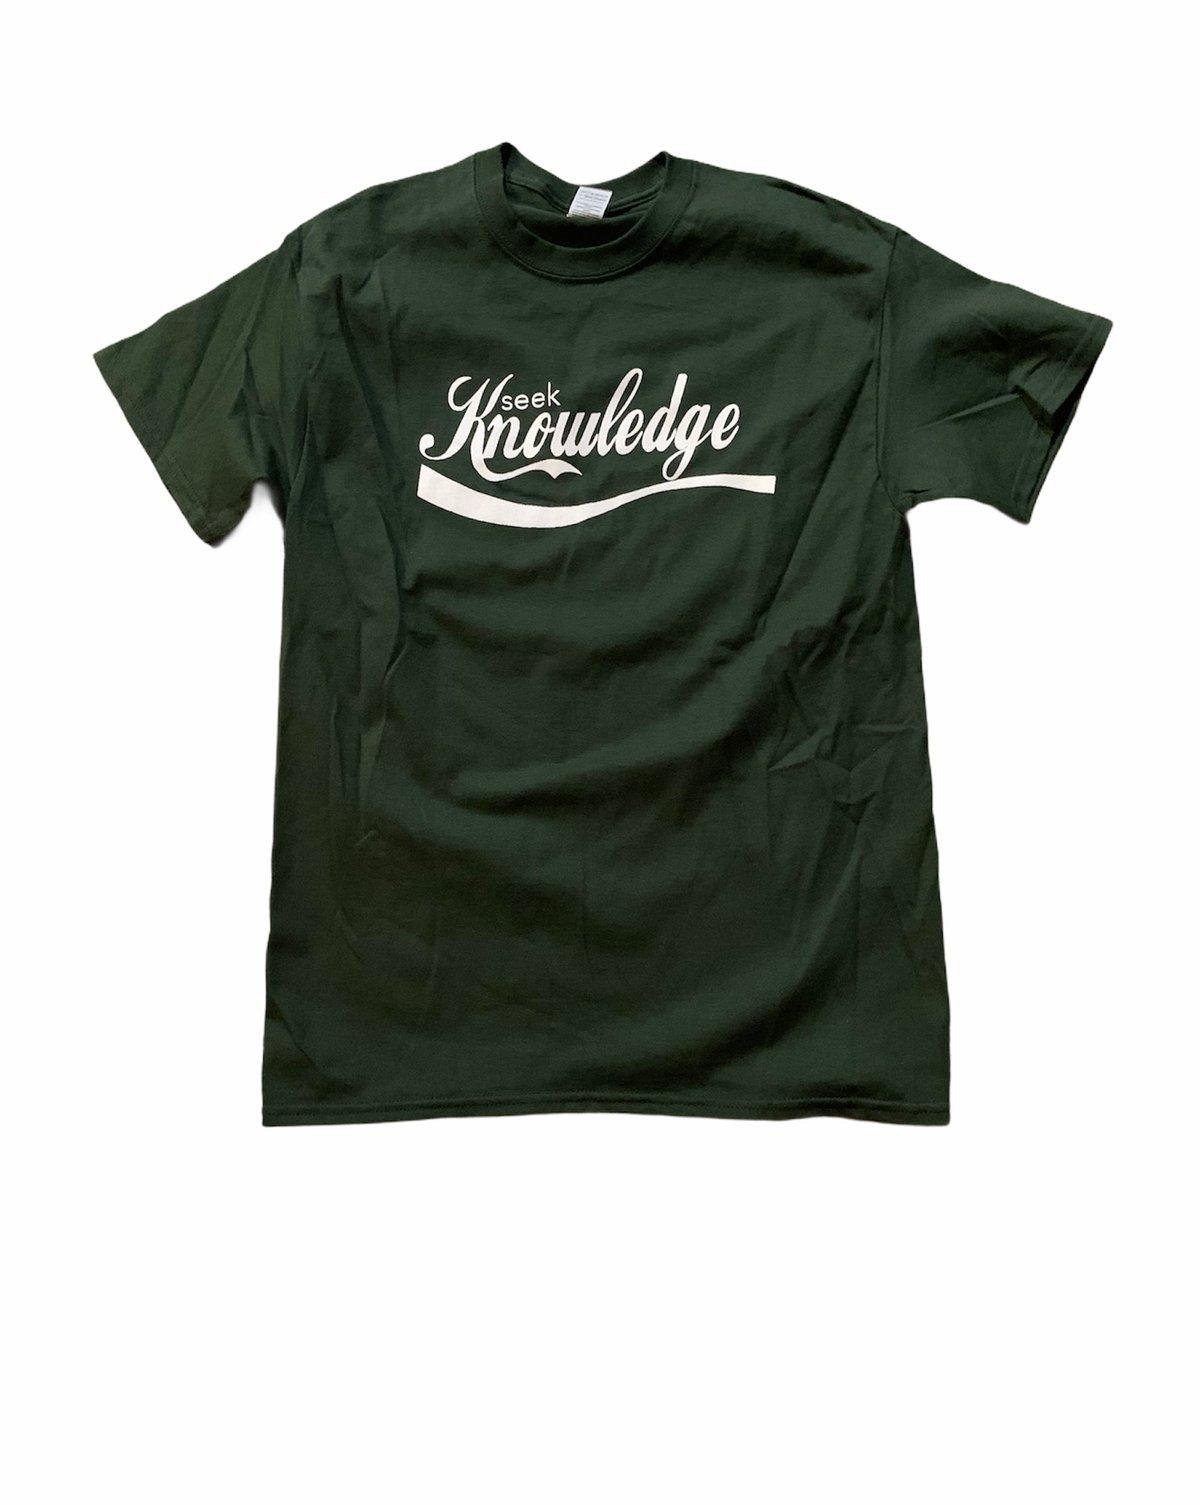 "Image of Seek Knowledge "" Green Tea "" shirt"